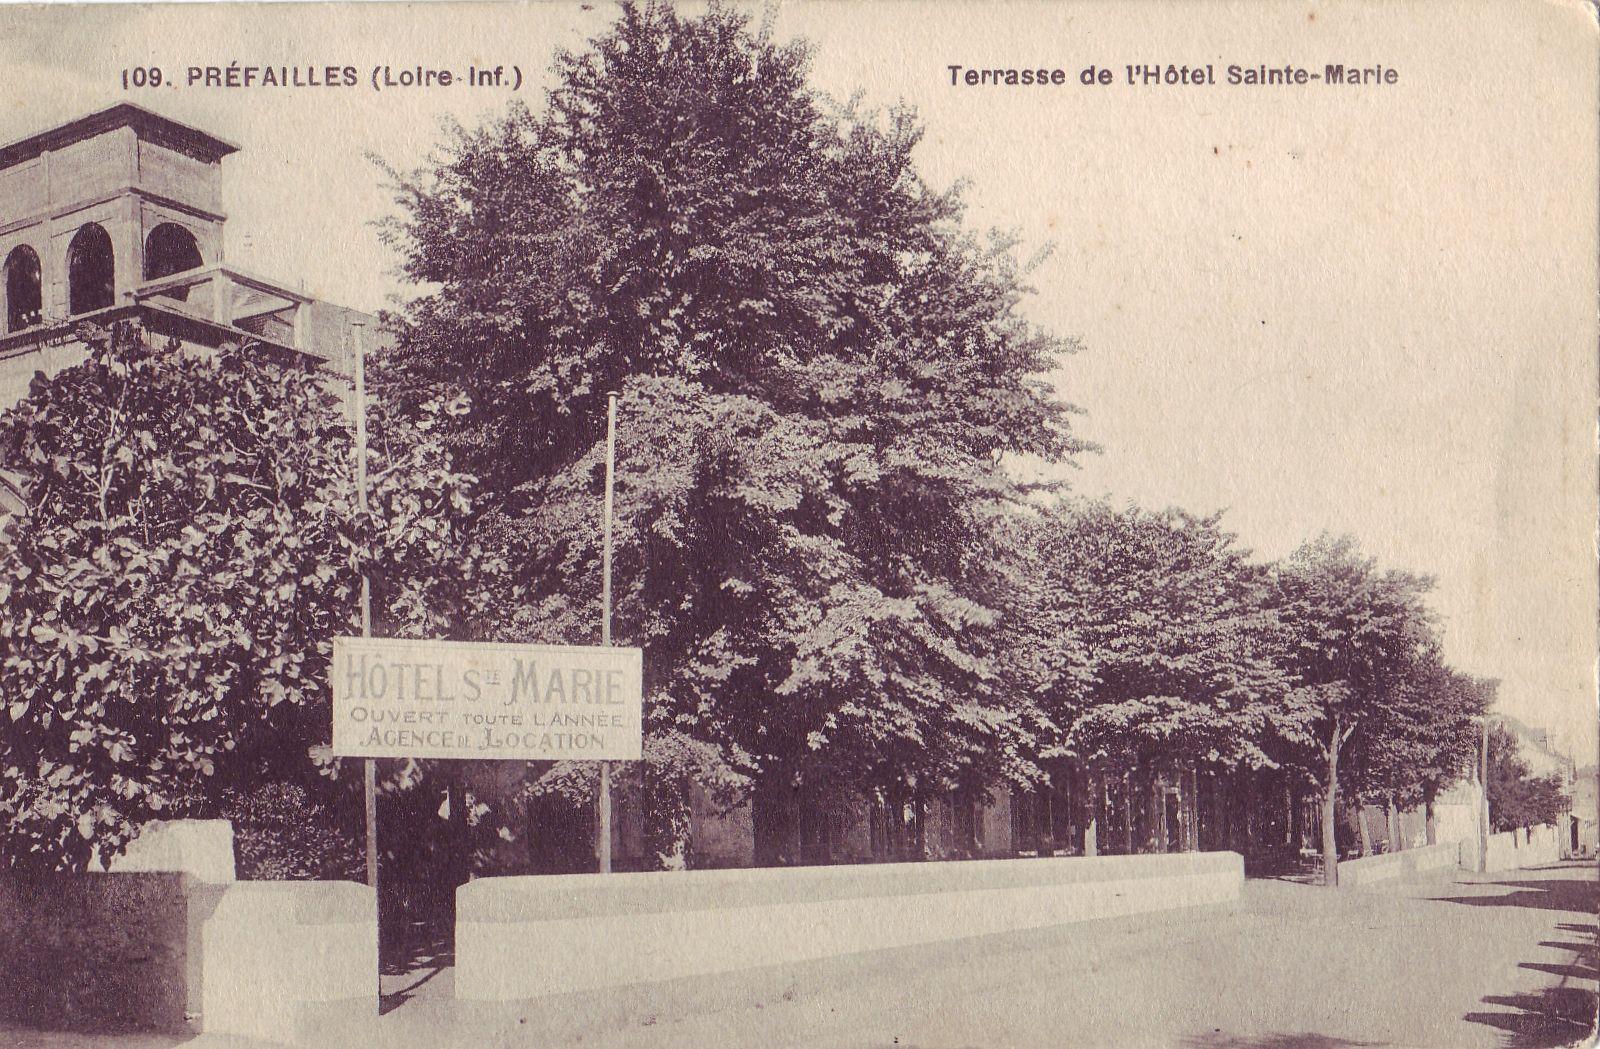 Hôtel Sainte-Marie 1